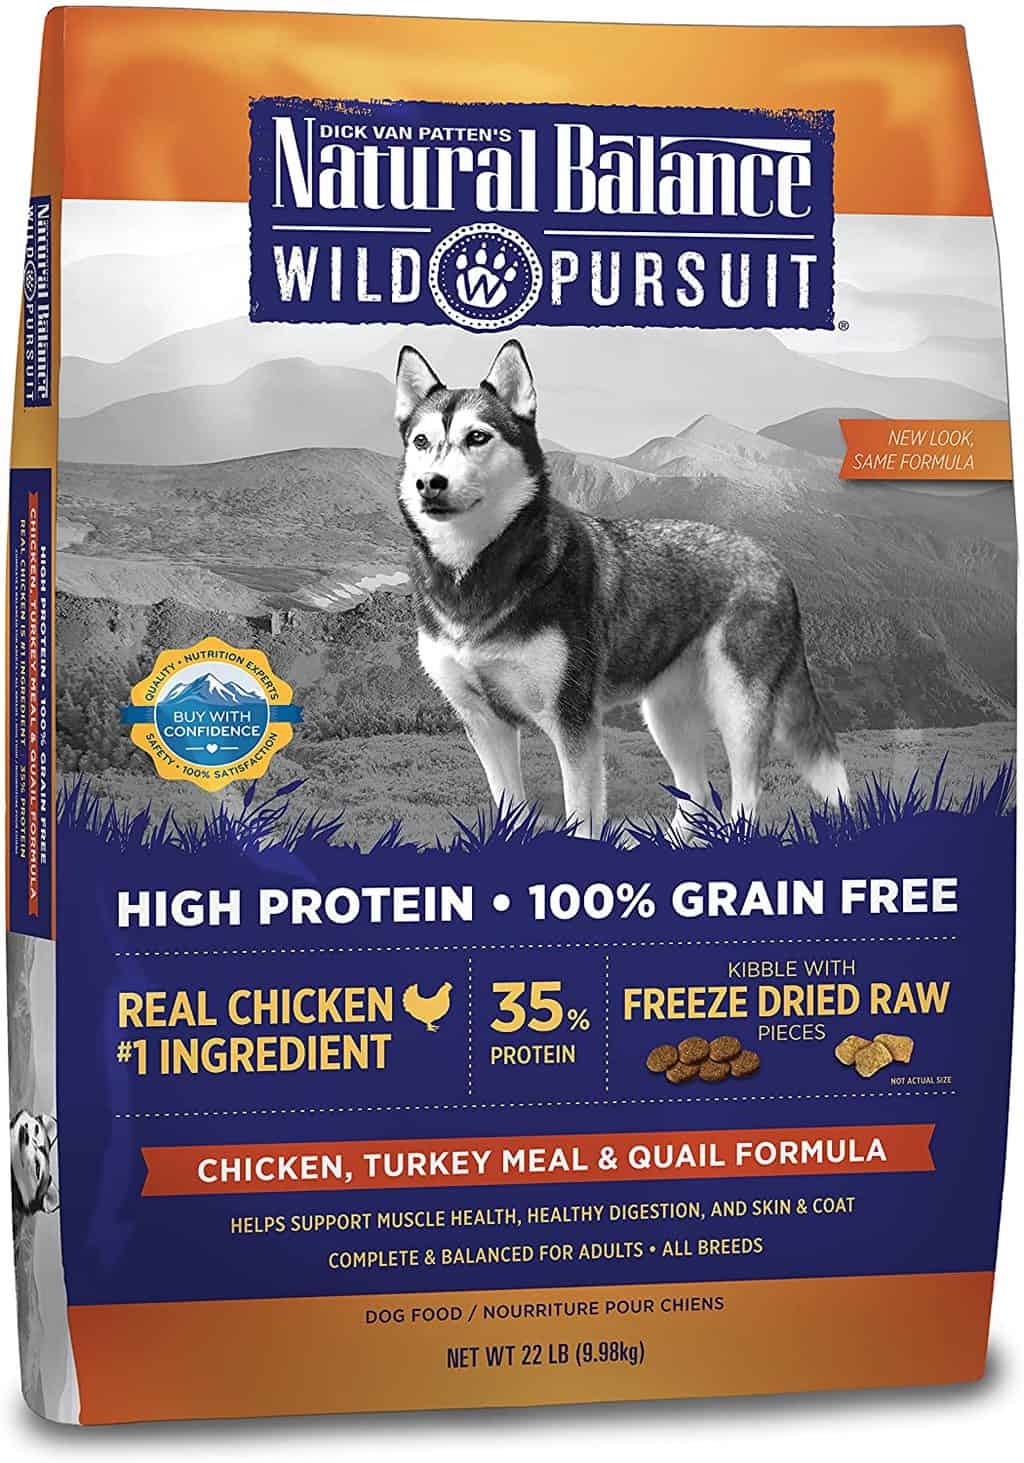 Natural Balance Dog Food Review 2020: Best High Quality Pet Food? 3